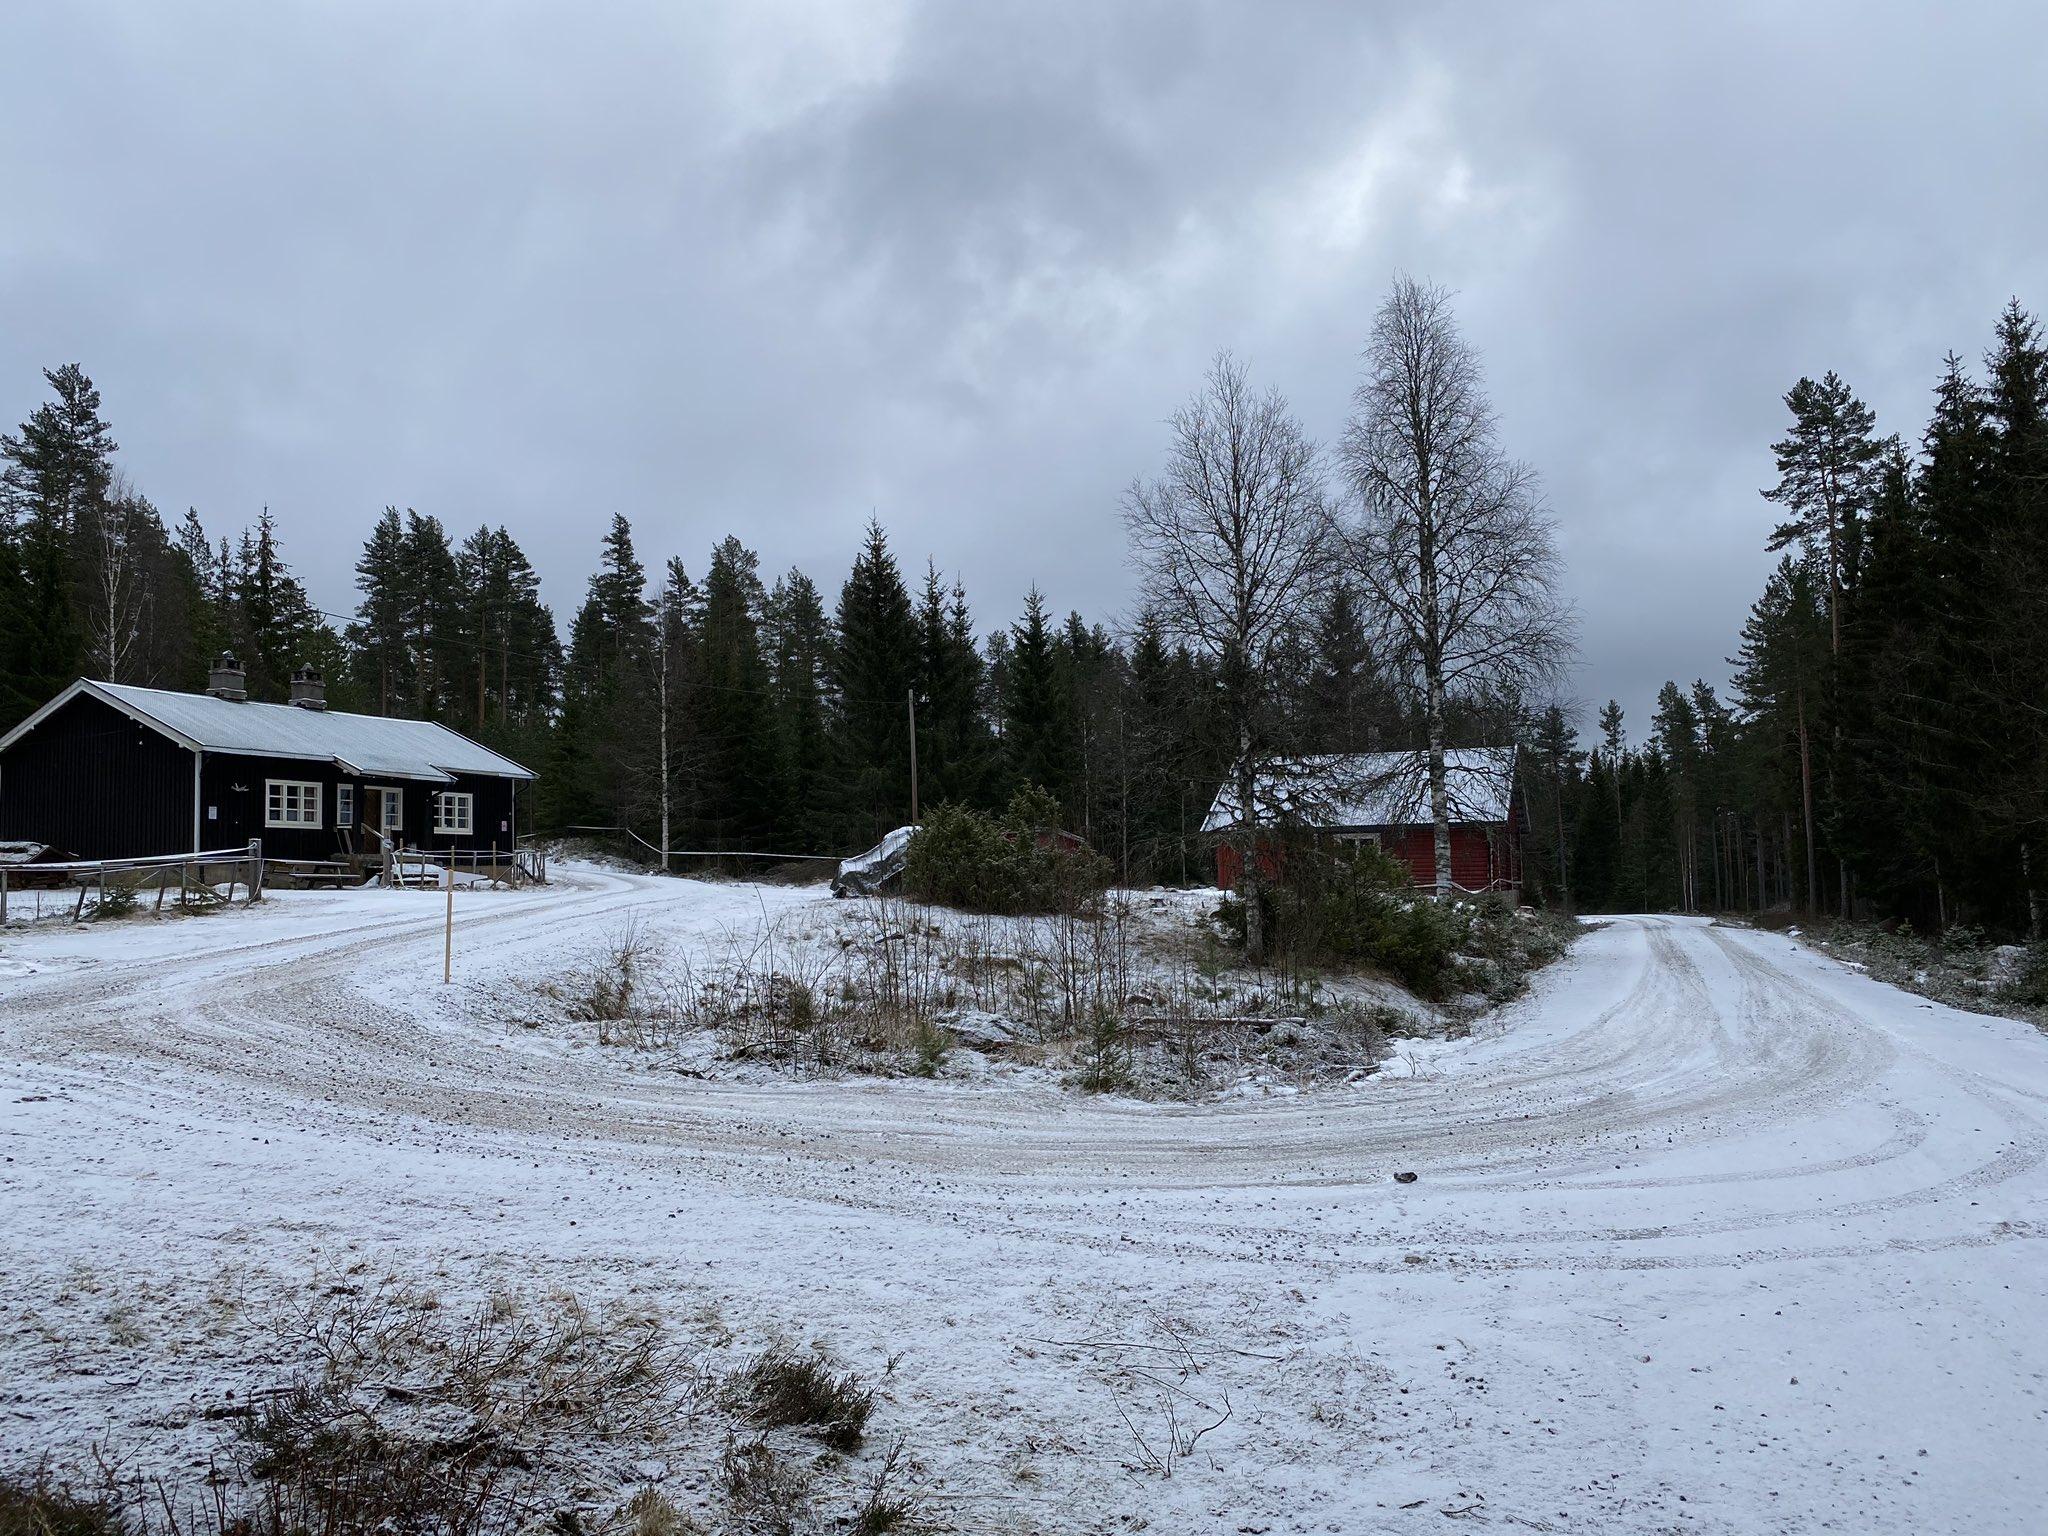 WRC: 68º Rallye Sweden [13-16 Febrero] - Página 2 EQkRfC5WsAAZ5q2?format=jpg&name=4096x4096